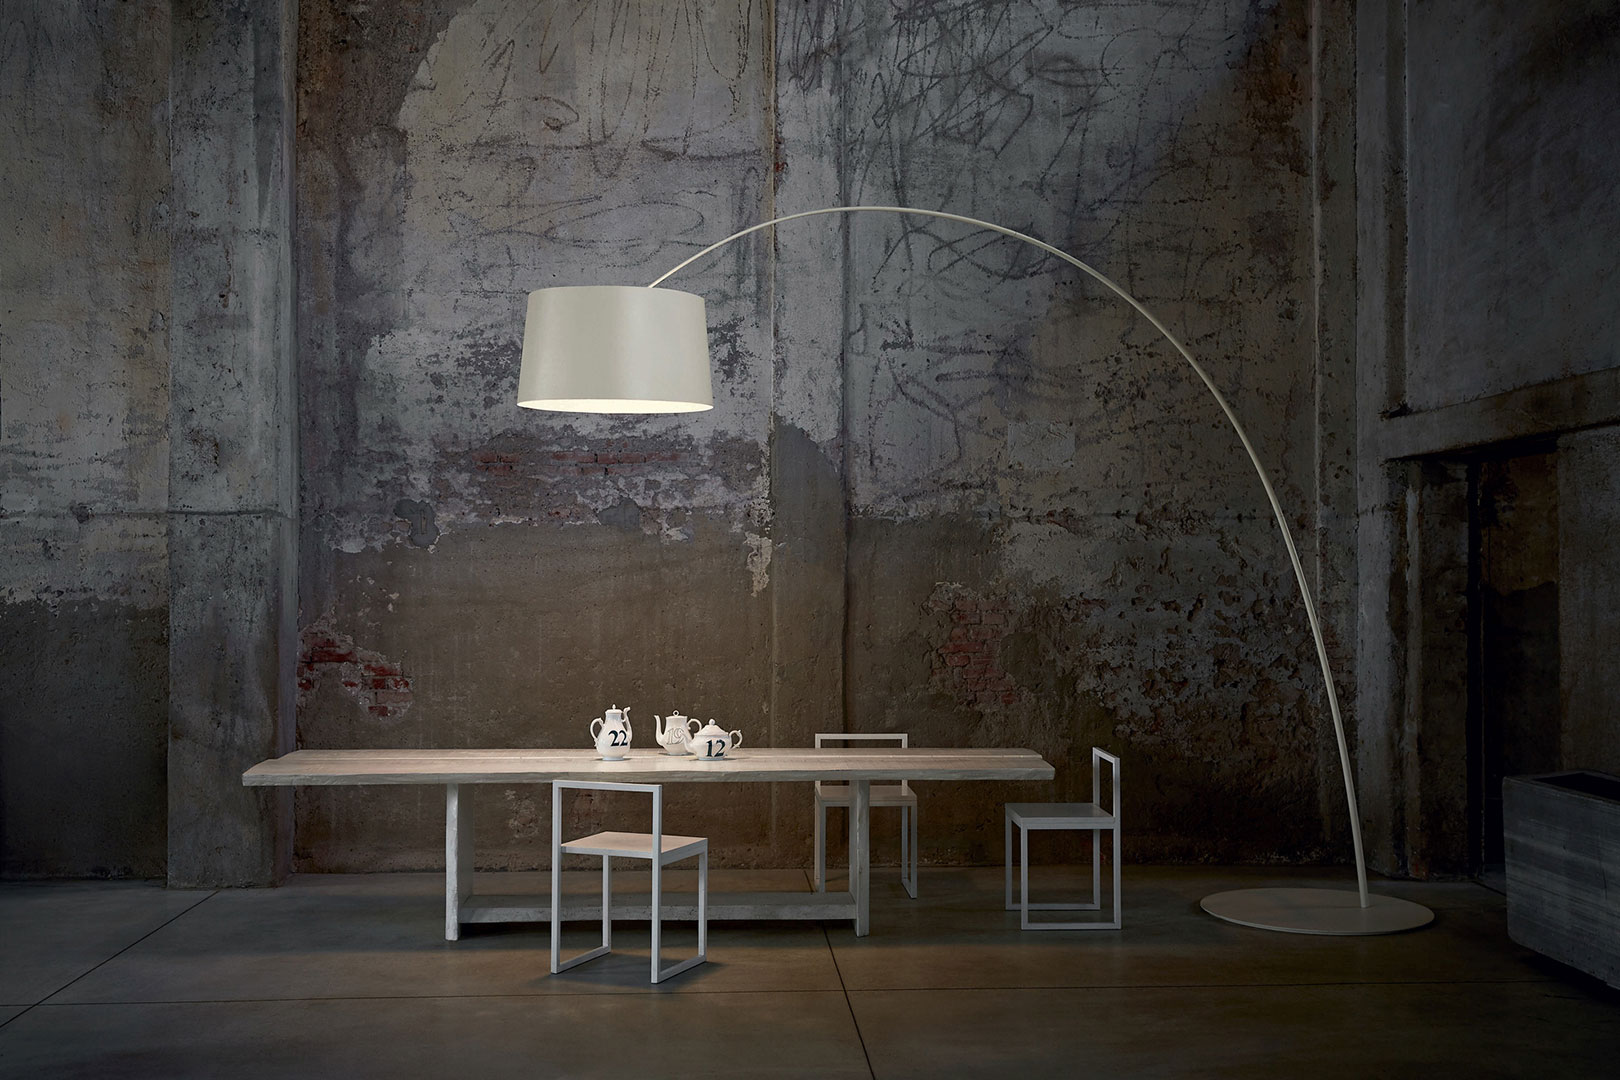 Plafoniera Foscarini : Twiggy floor lamps in living room the best solution foscarini.com